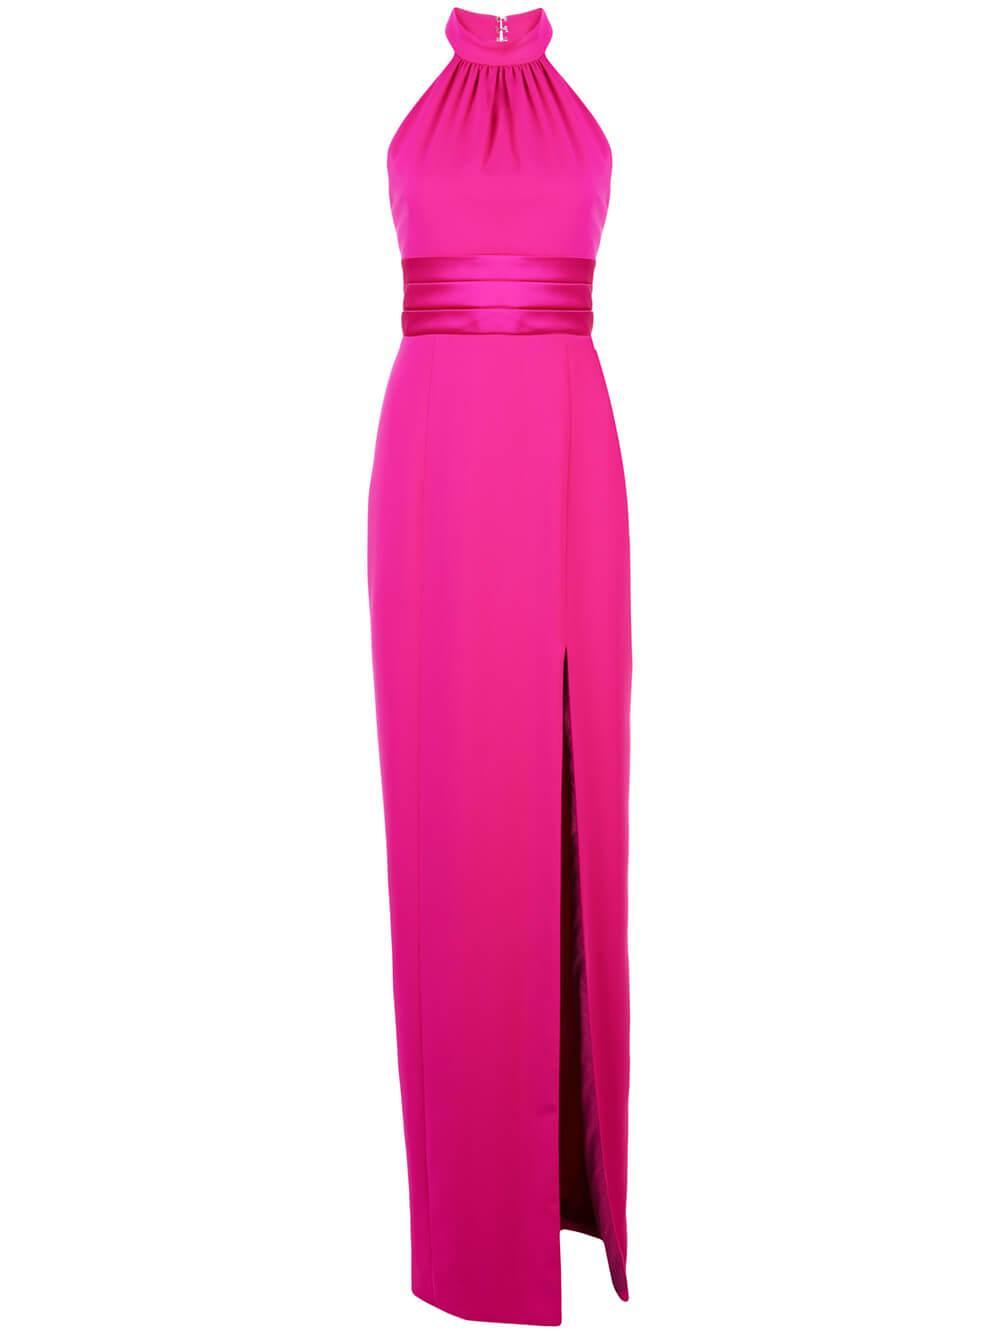 Open Back Cummerbund Belted Gown Item # 119601